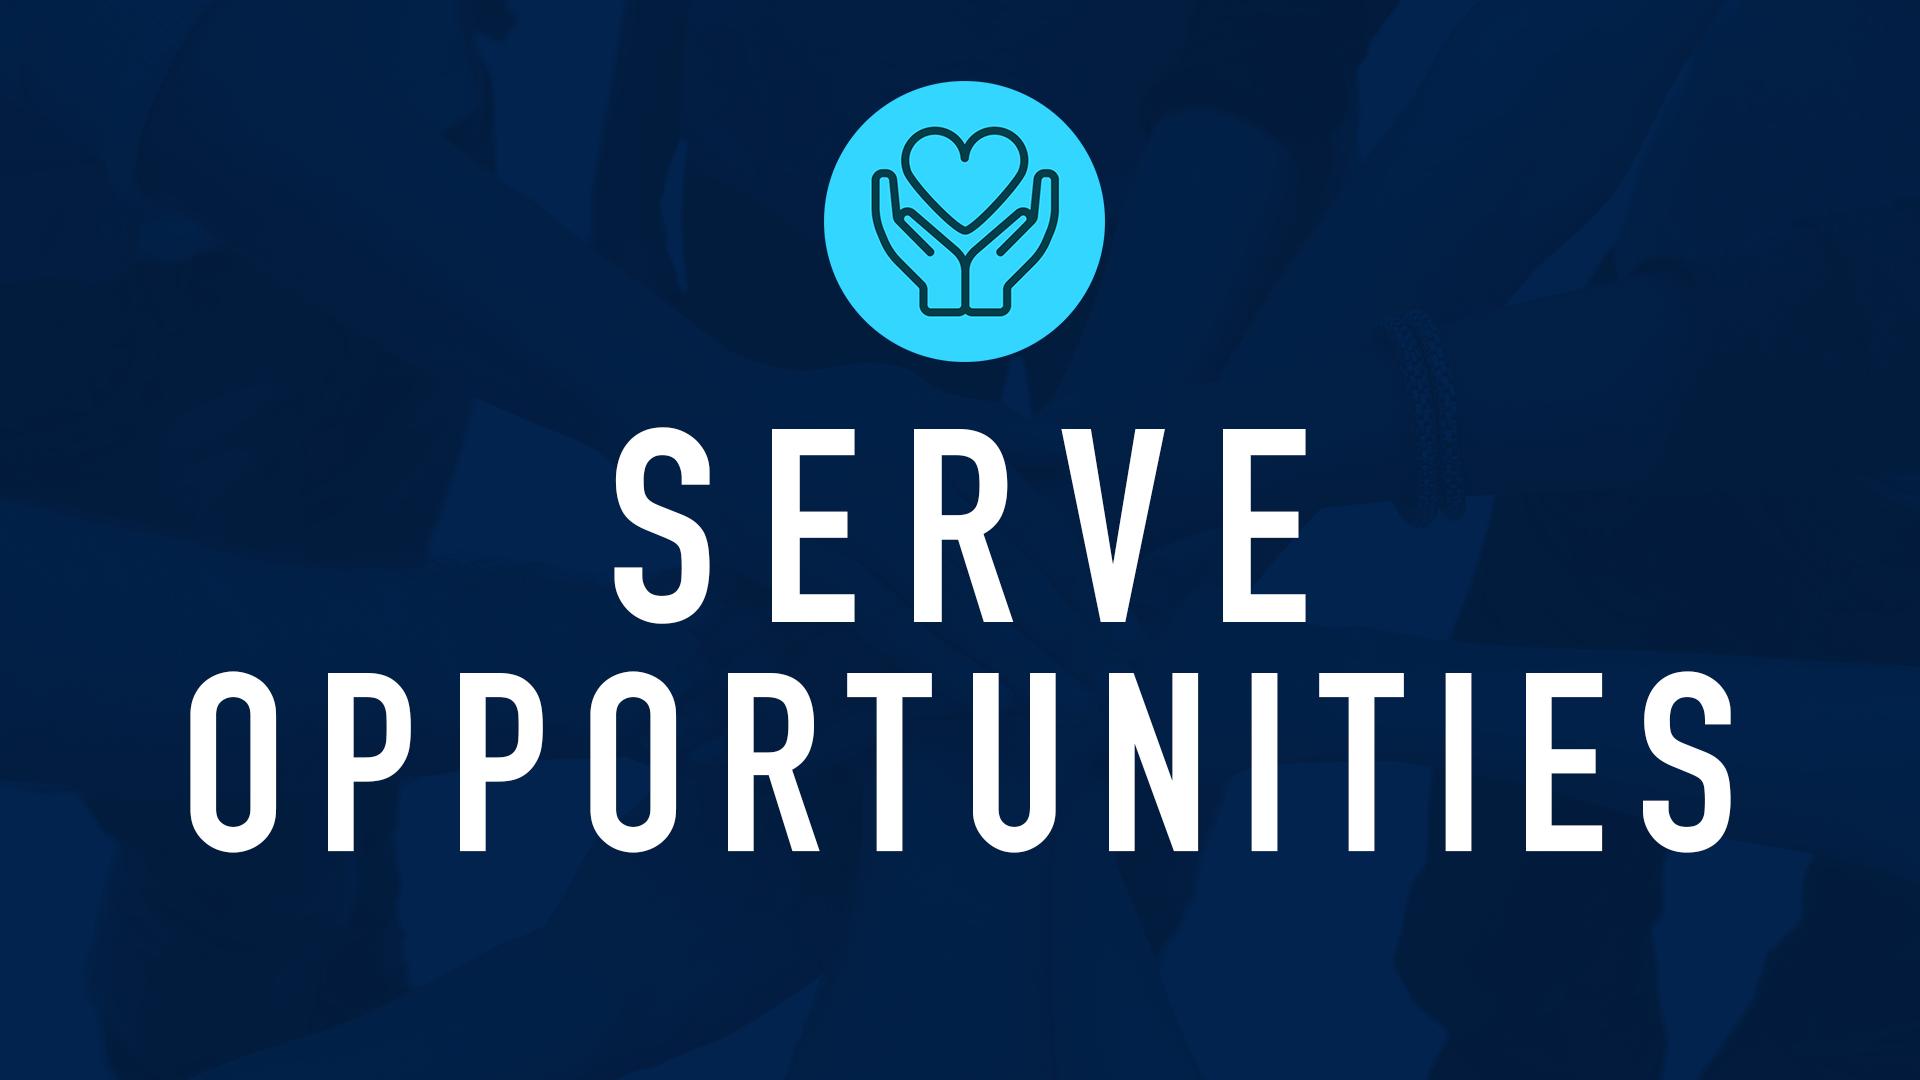 Serve Opportunities